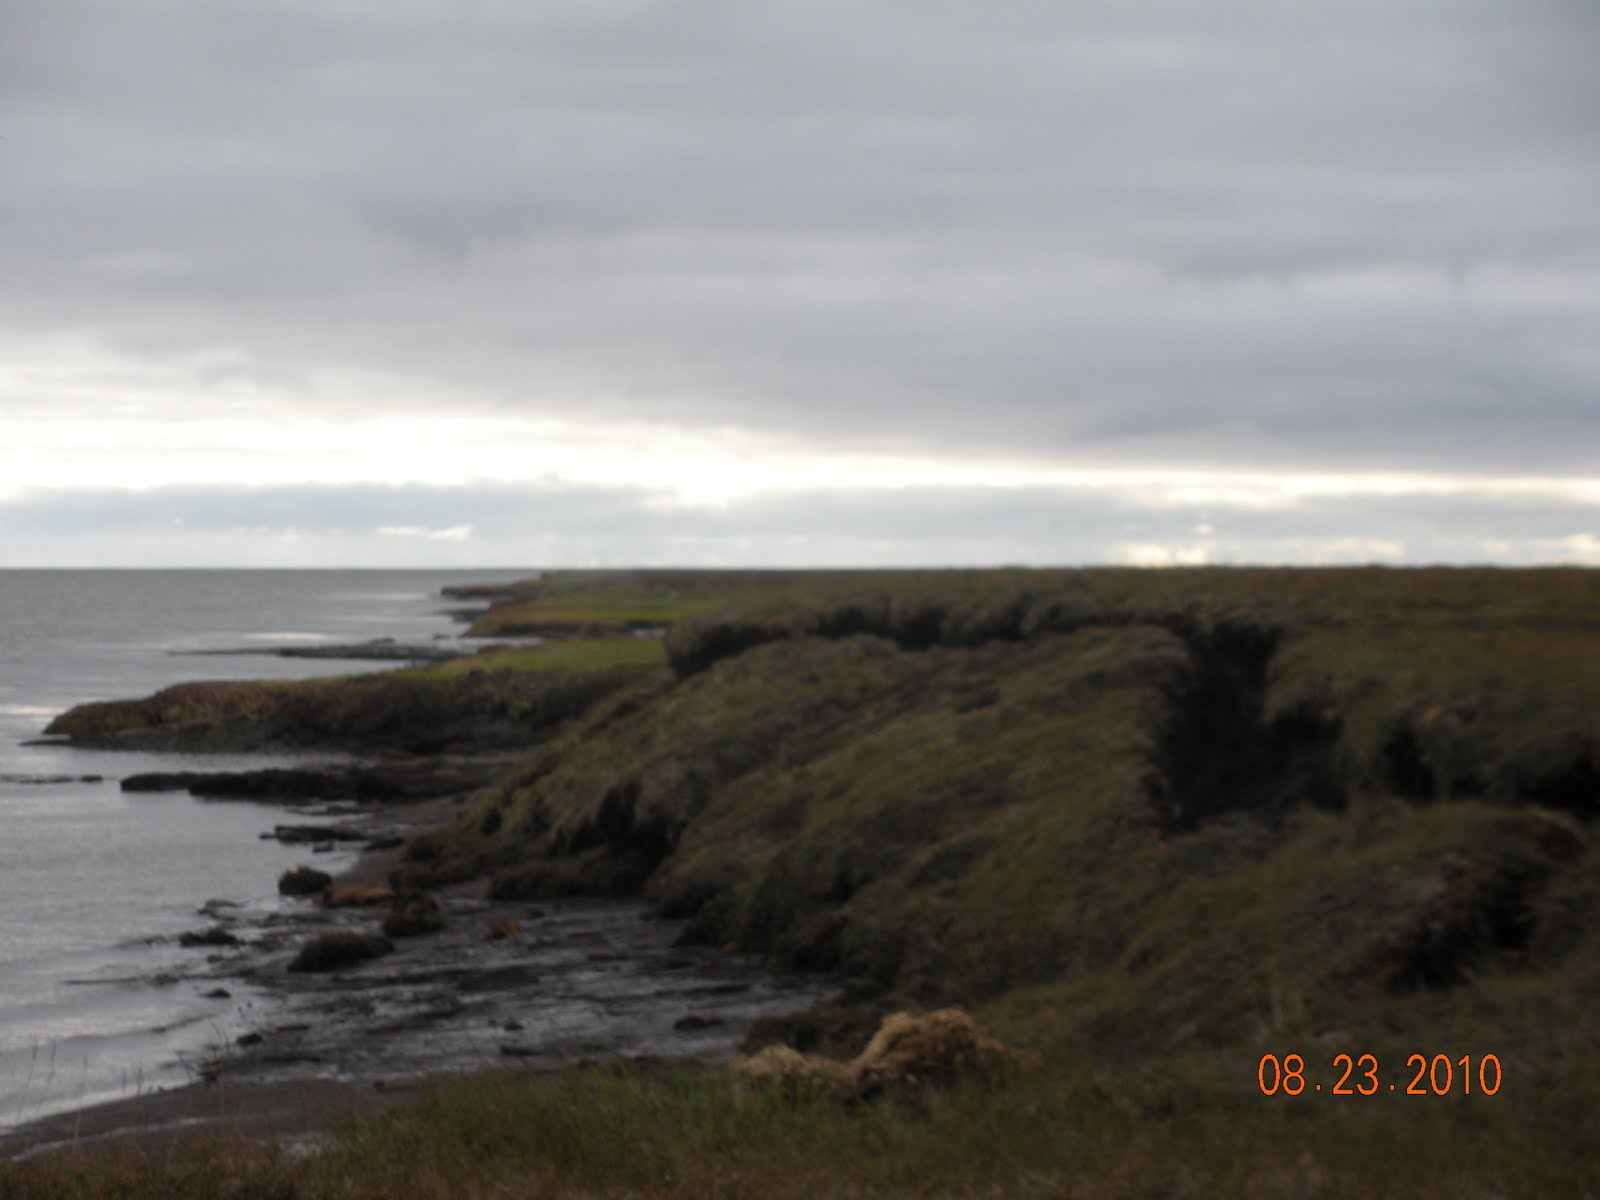 julie u0026 39 s blog  permafrost layer erosion  newtok  alaska